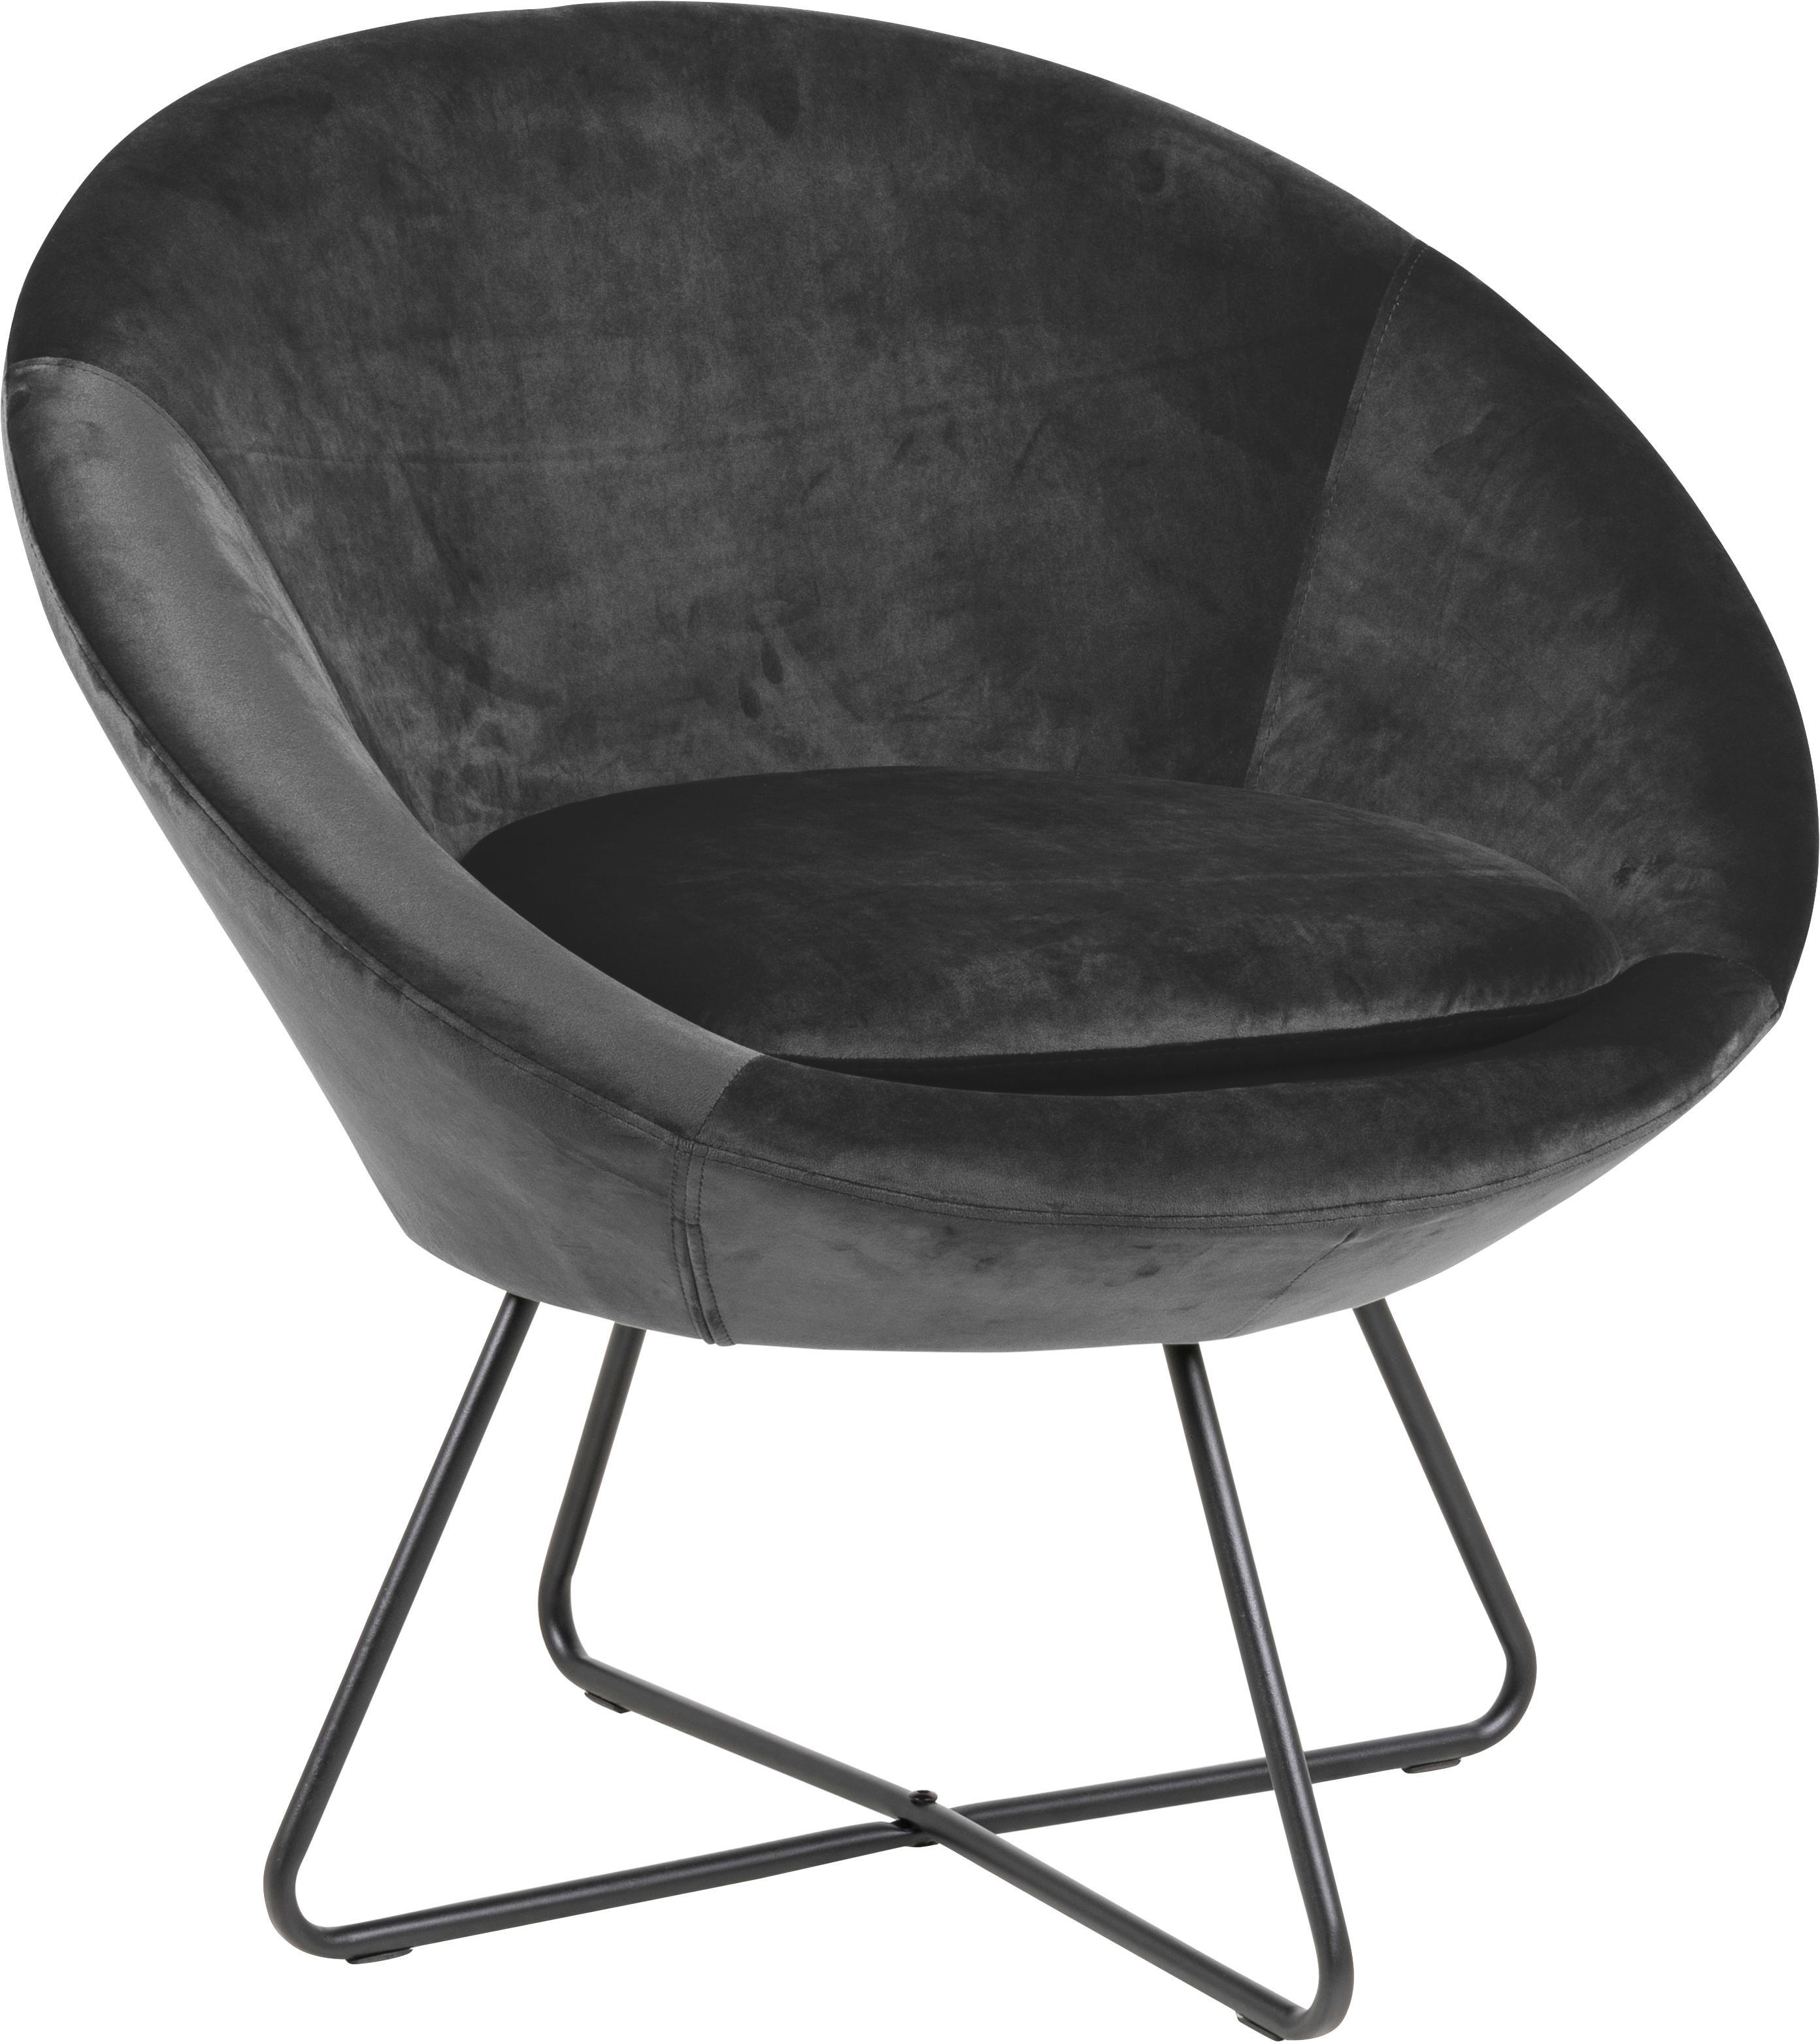 Fluwelen fauteuil Center in grijs, Bekleding: polyester fluweel, Frame: gecoat metaal, Donkergrijs, zwart, 82 x 71 cm